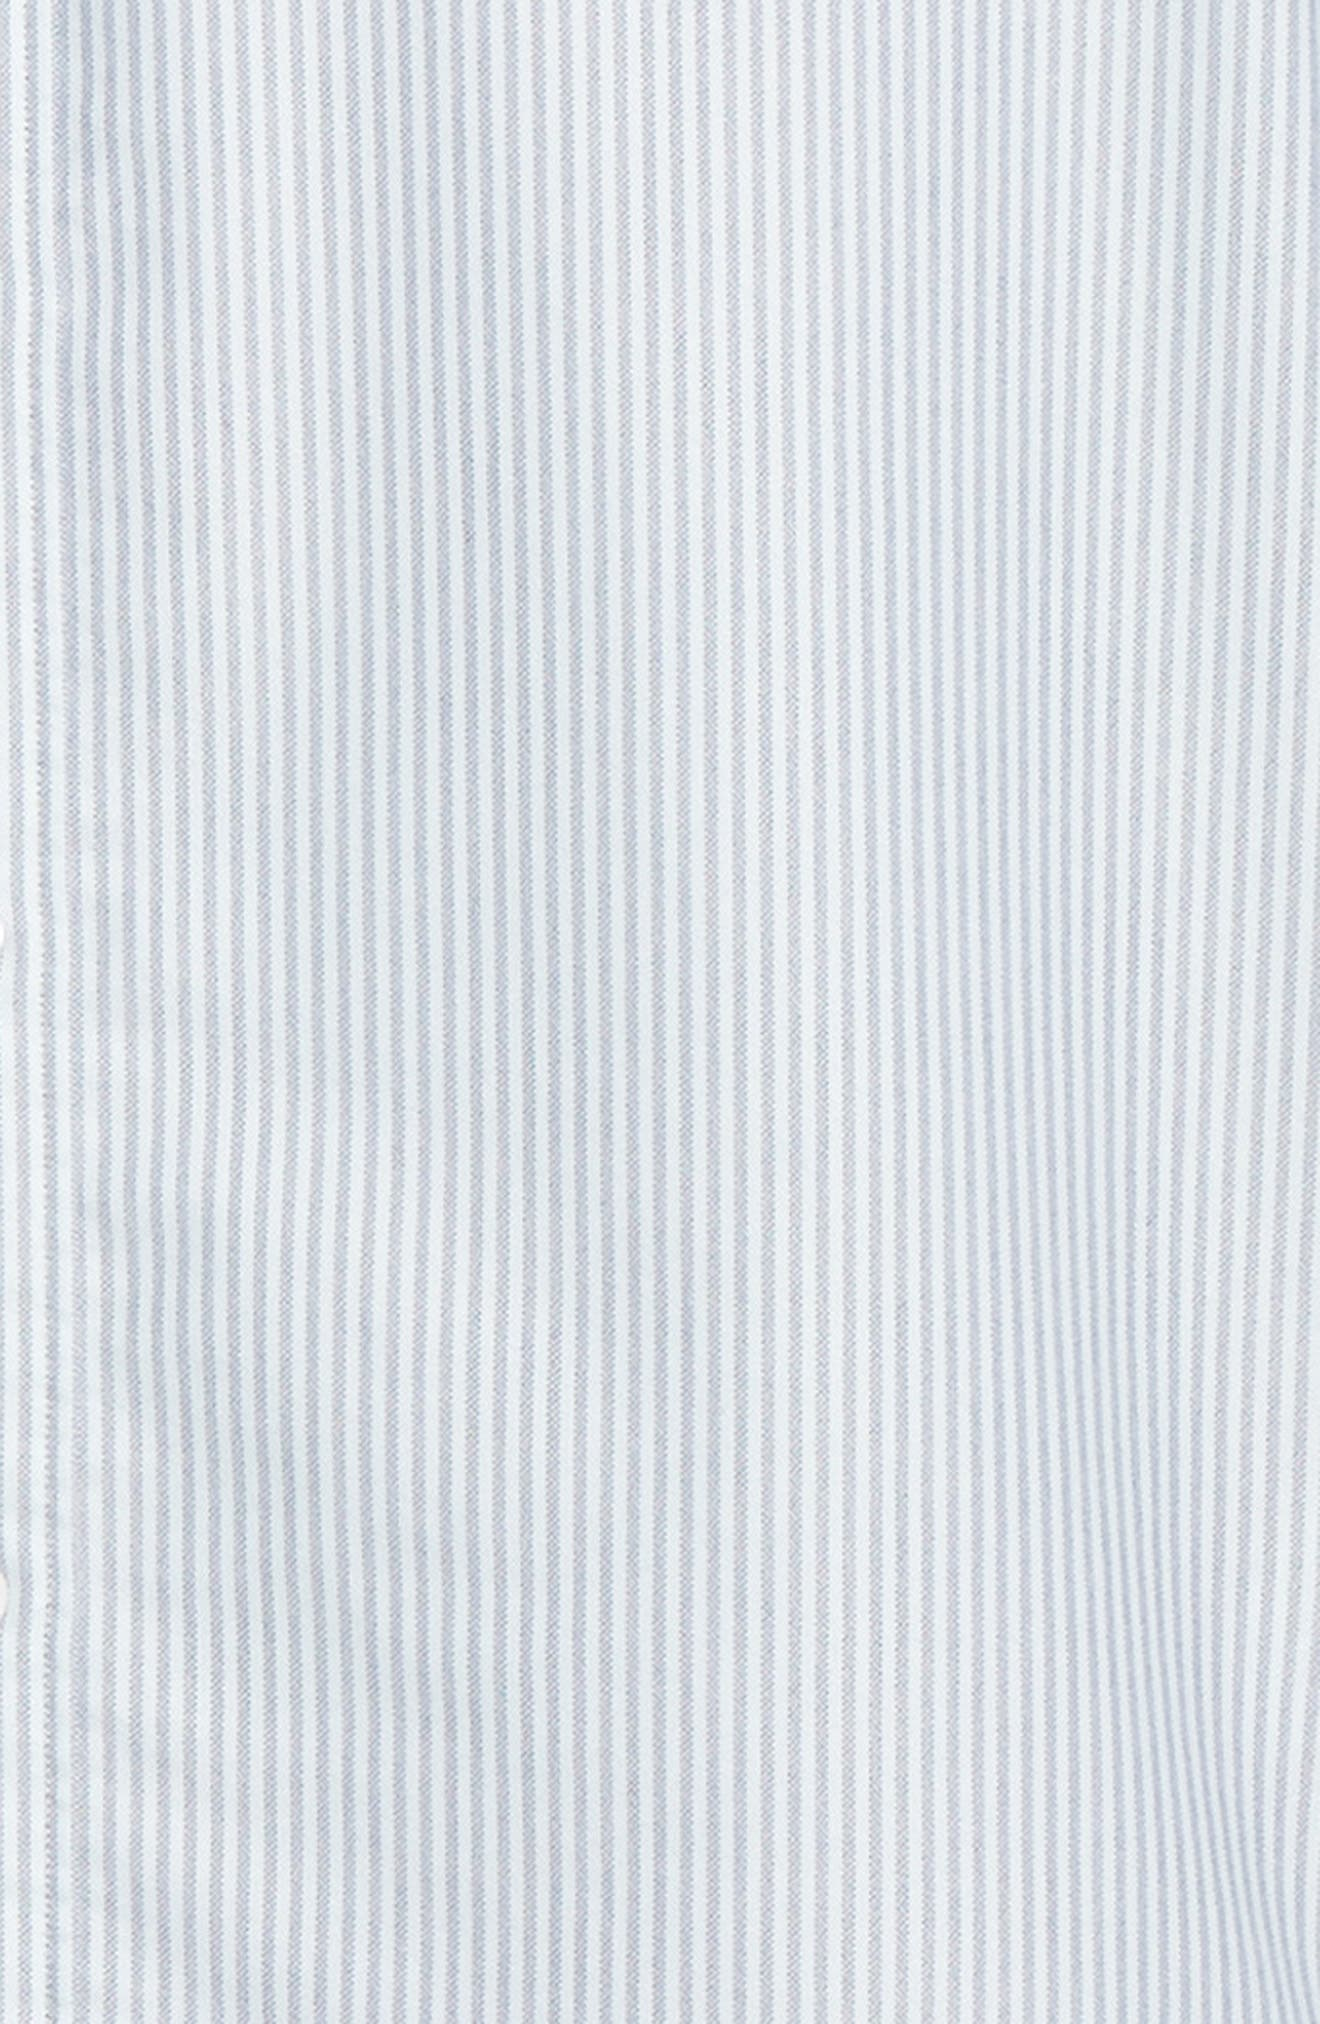 Trim Fit Bengal Stripe Sport Shirt,                             Alternate thumbnail 6, color,                             BLUE ENSIGN MINT STRIPE